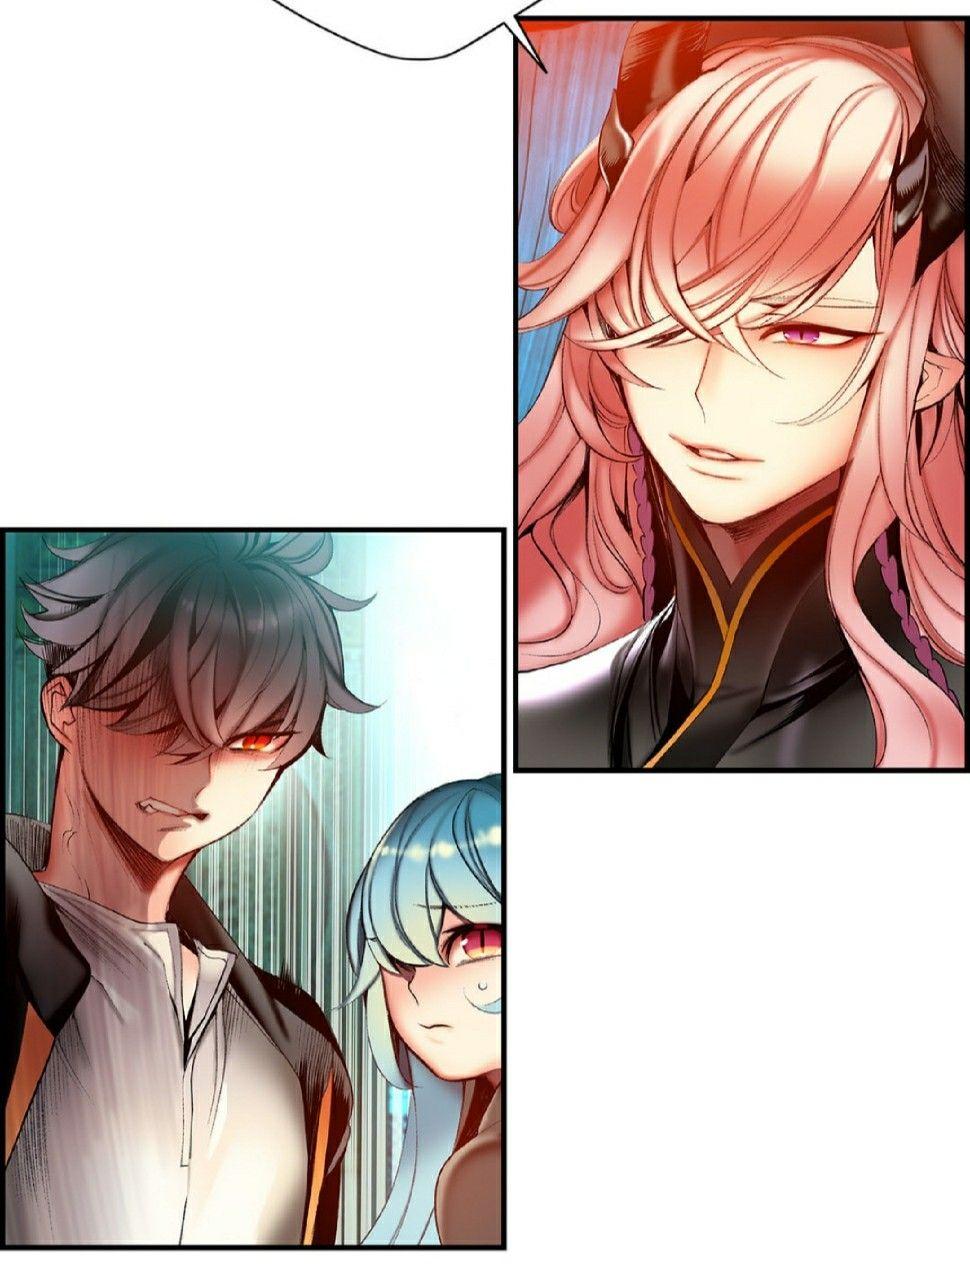 Pin by Yin Yumenosaki on nιcoтιne Manga, Manhwa, Webtoon